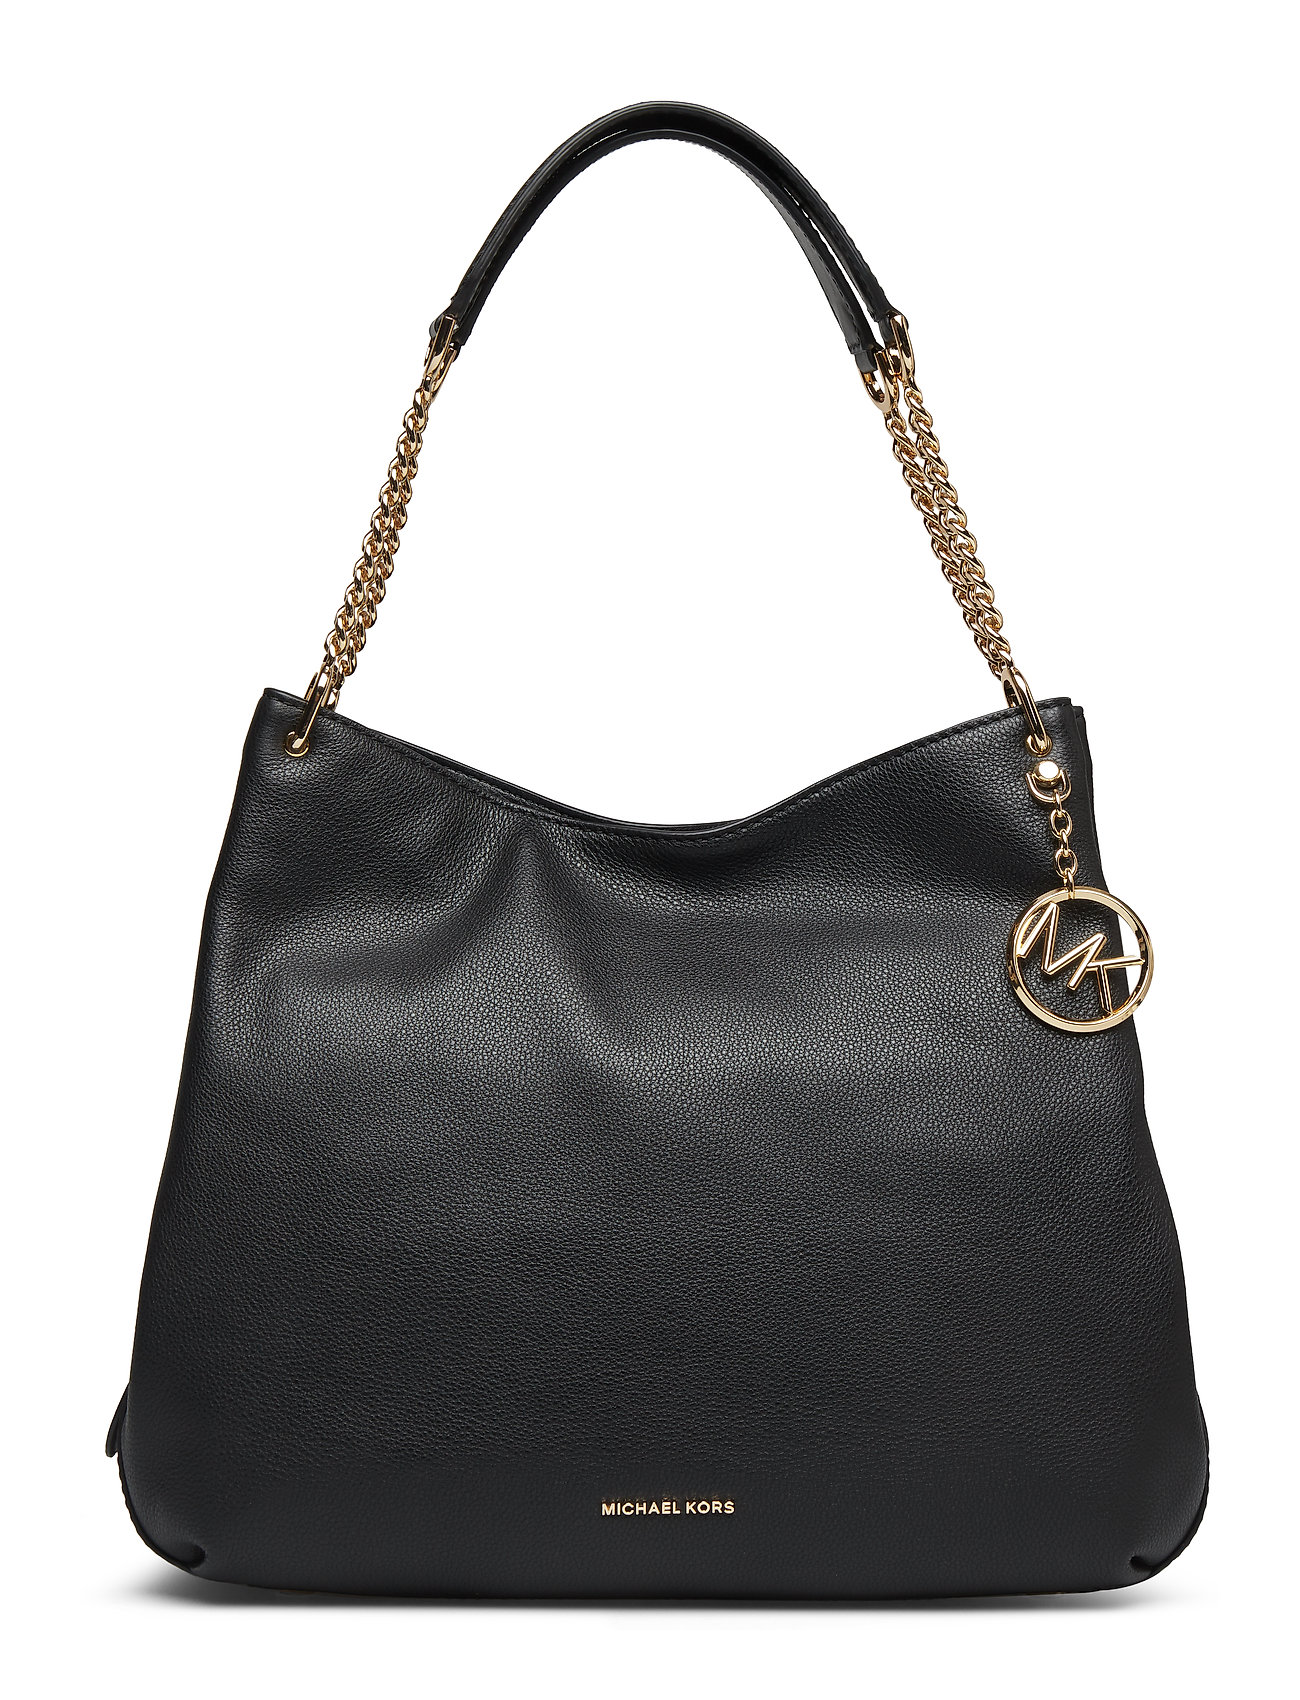 MICHAEL KORS Lillie Lg Shldr Tote Bags Shoppers Fashion Shoppers Schwarz MICHAEL KORS BAGS